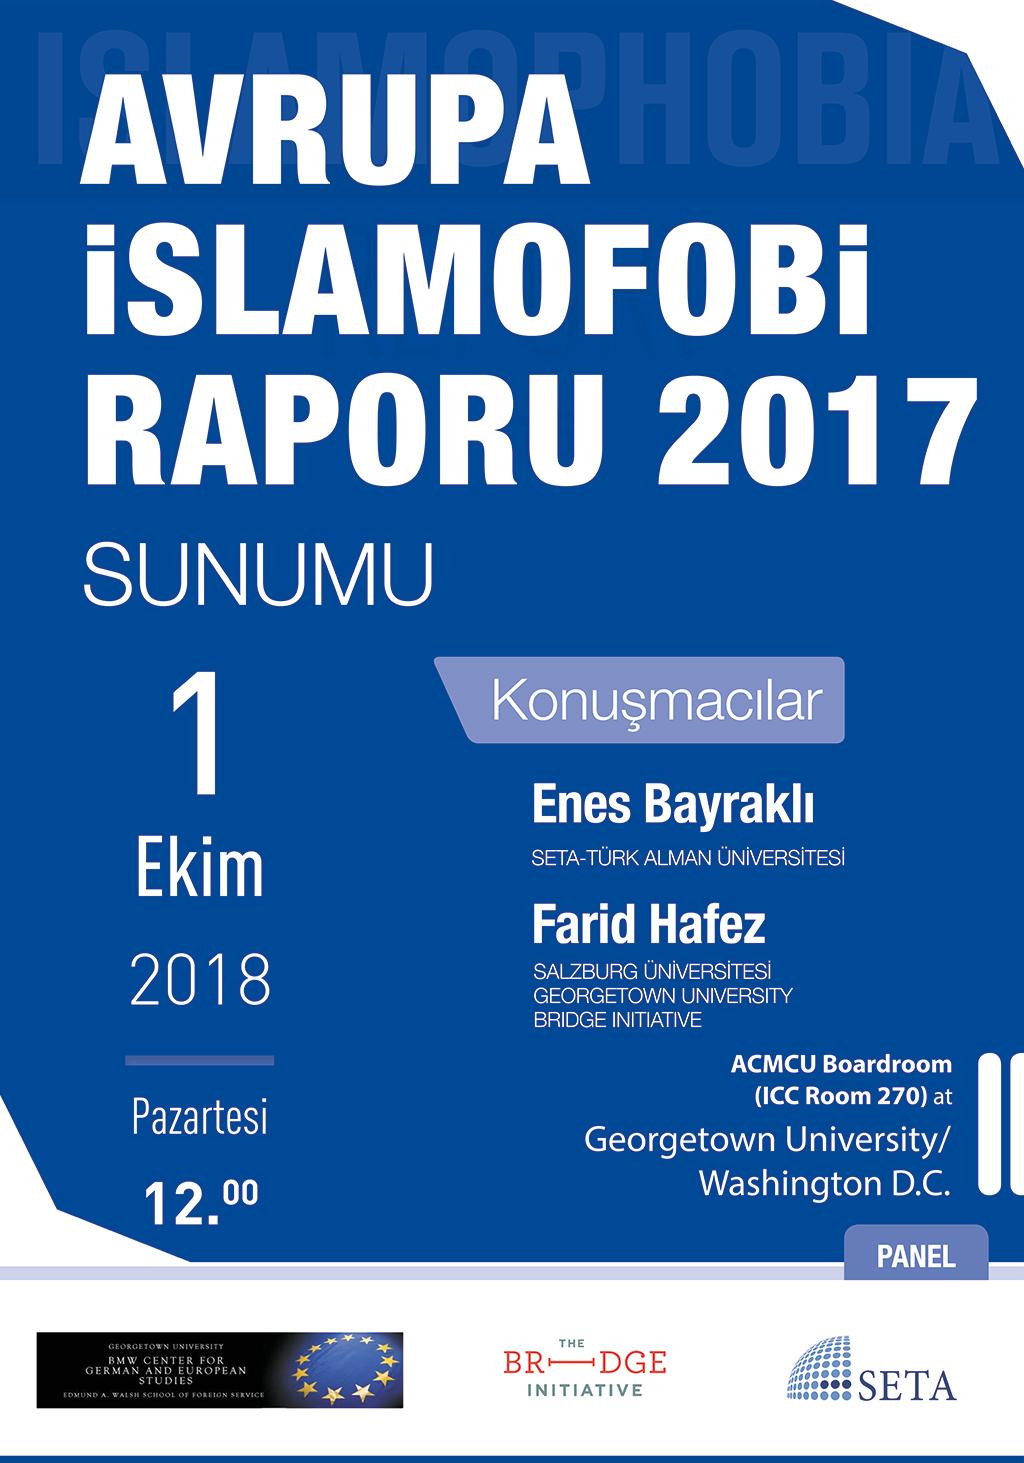 Avrupa İslamofobi Raporu 2017 Sunumu | Georgetown